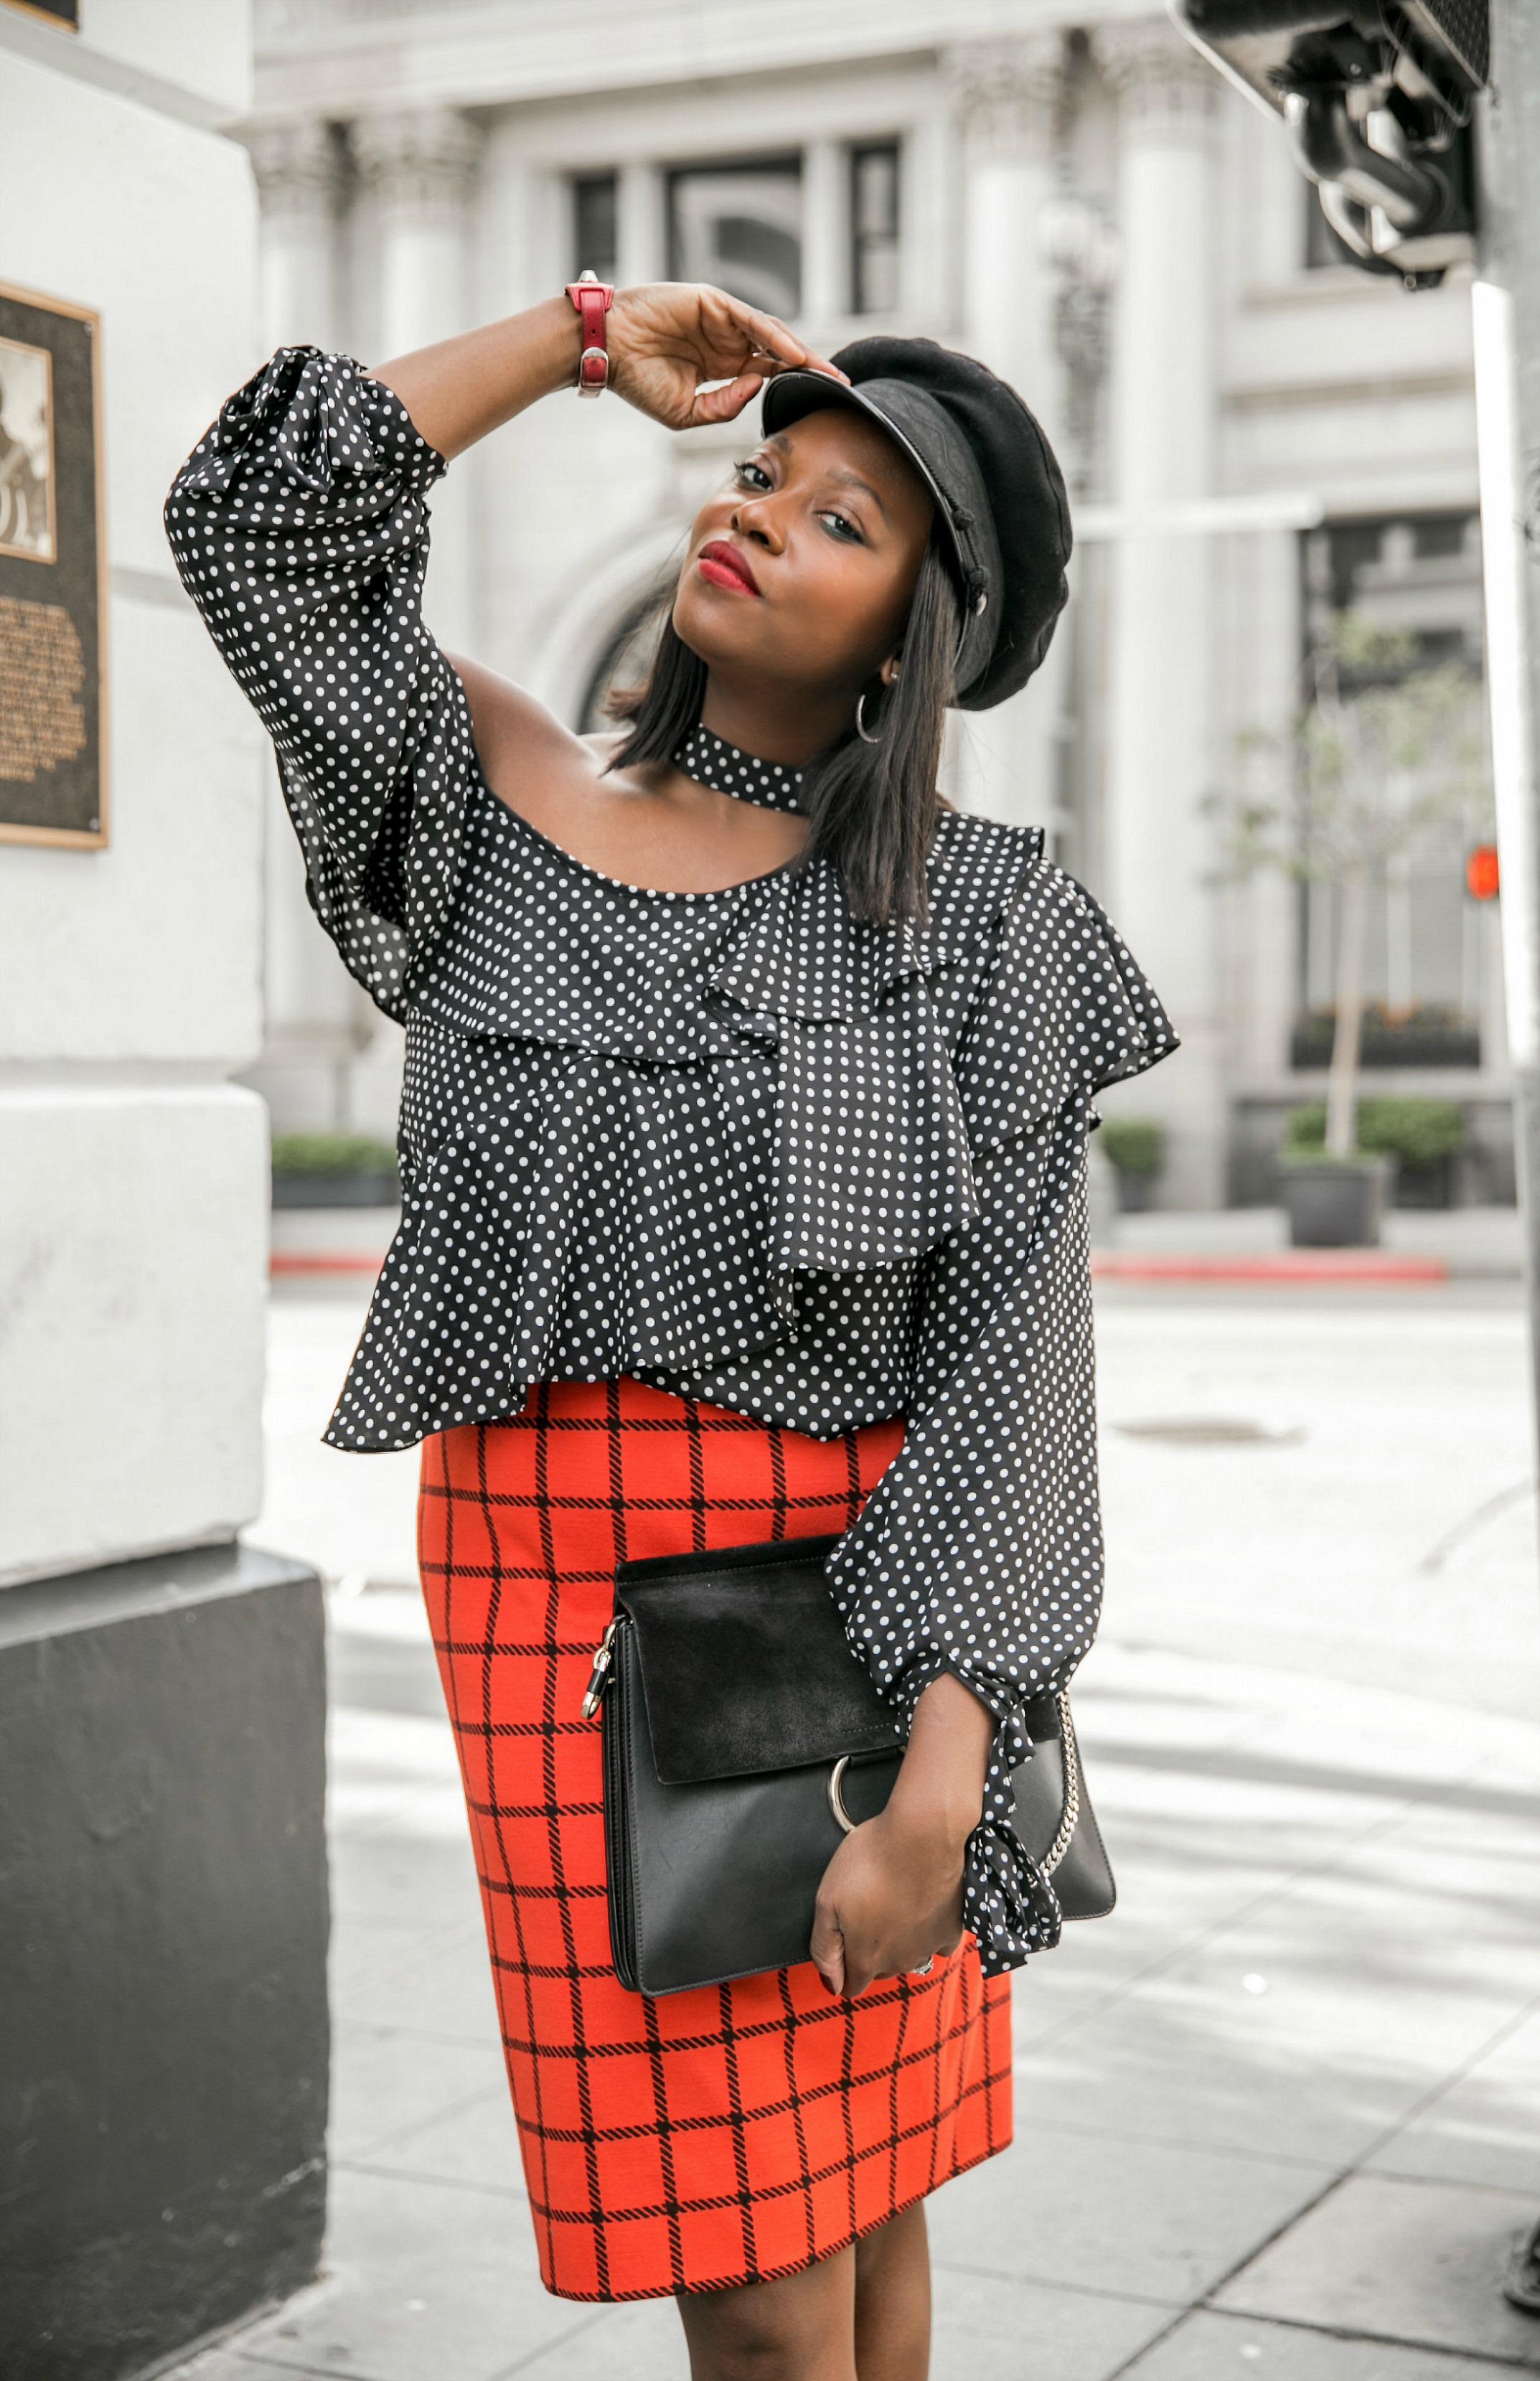 melissa_chataigne_fashion_stylist_chataigne_style